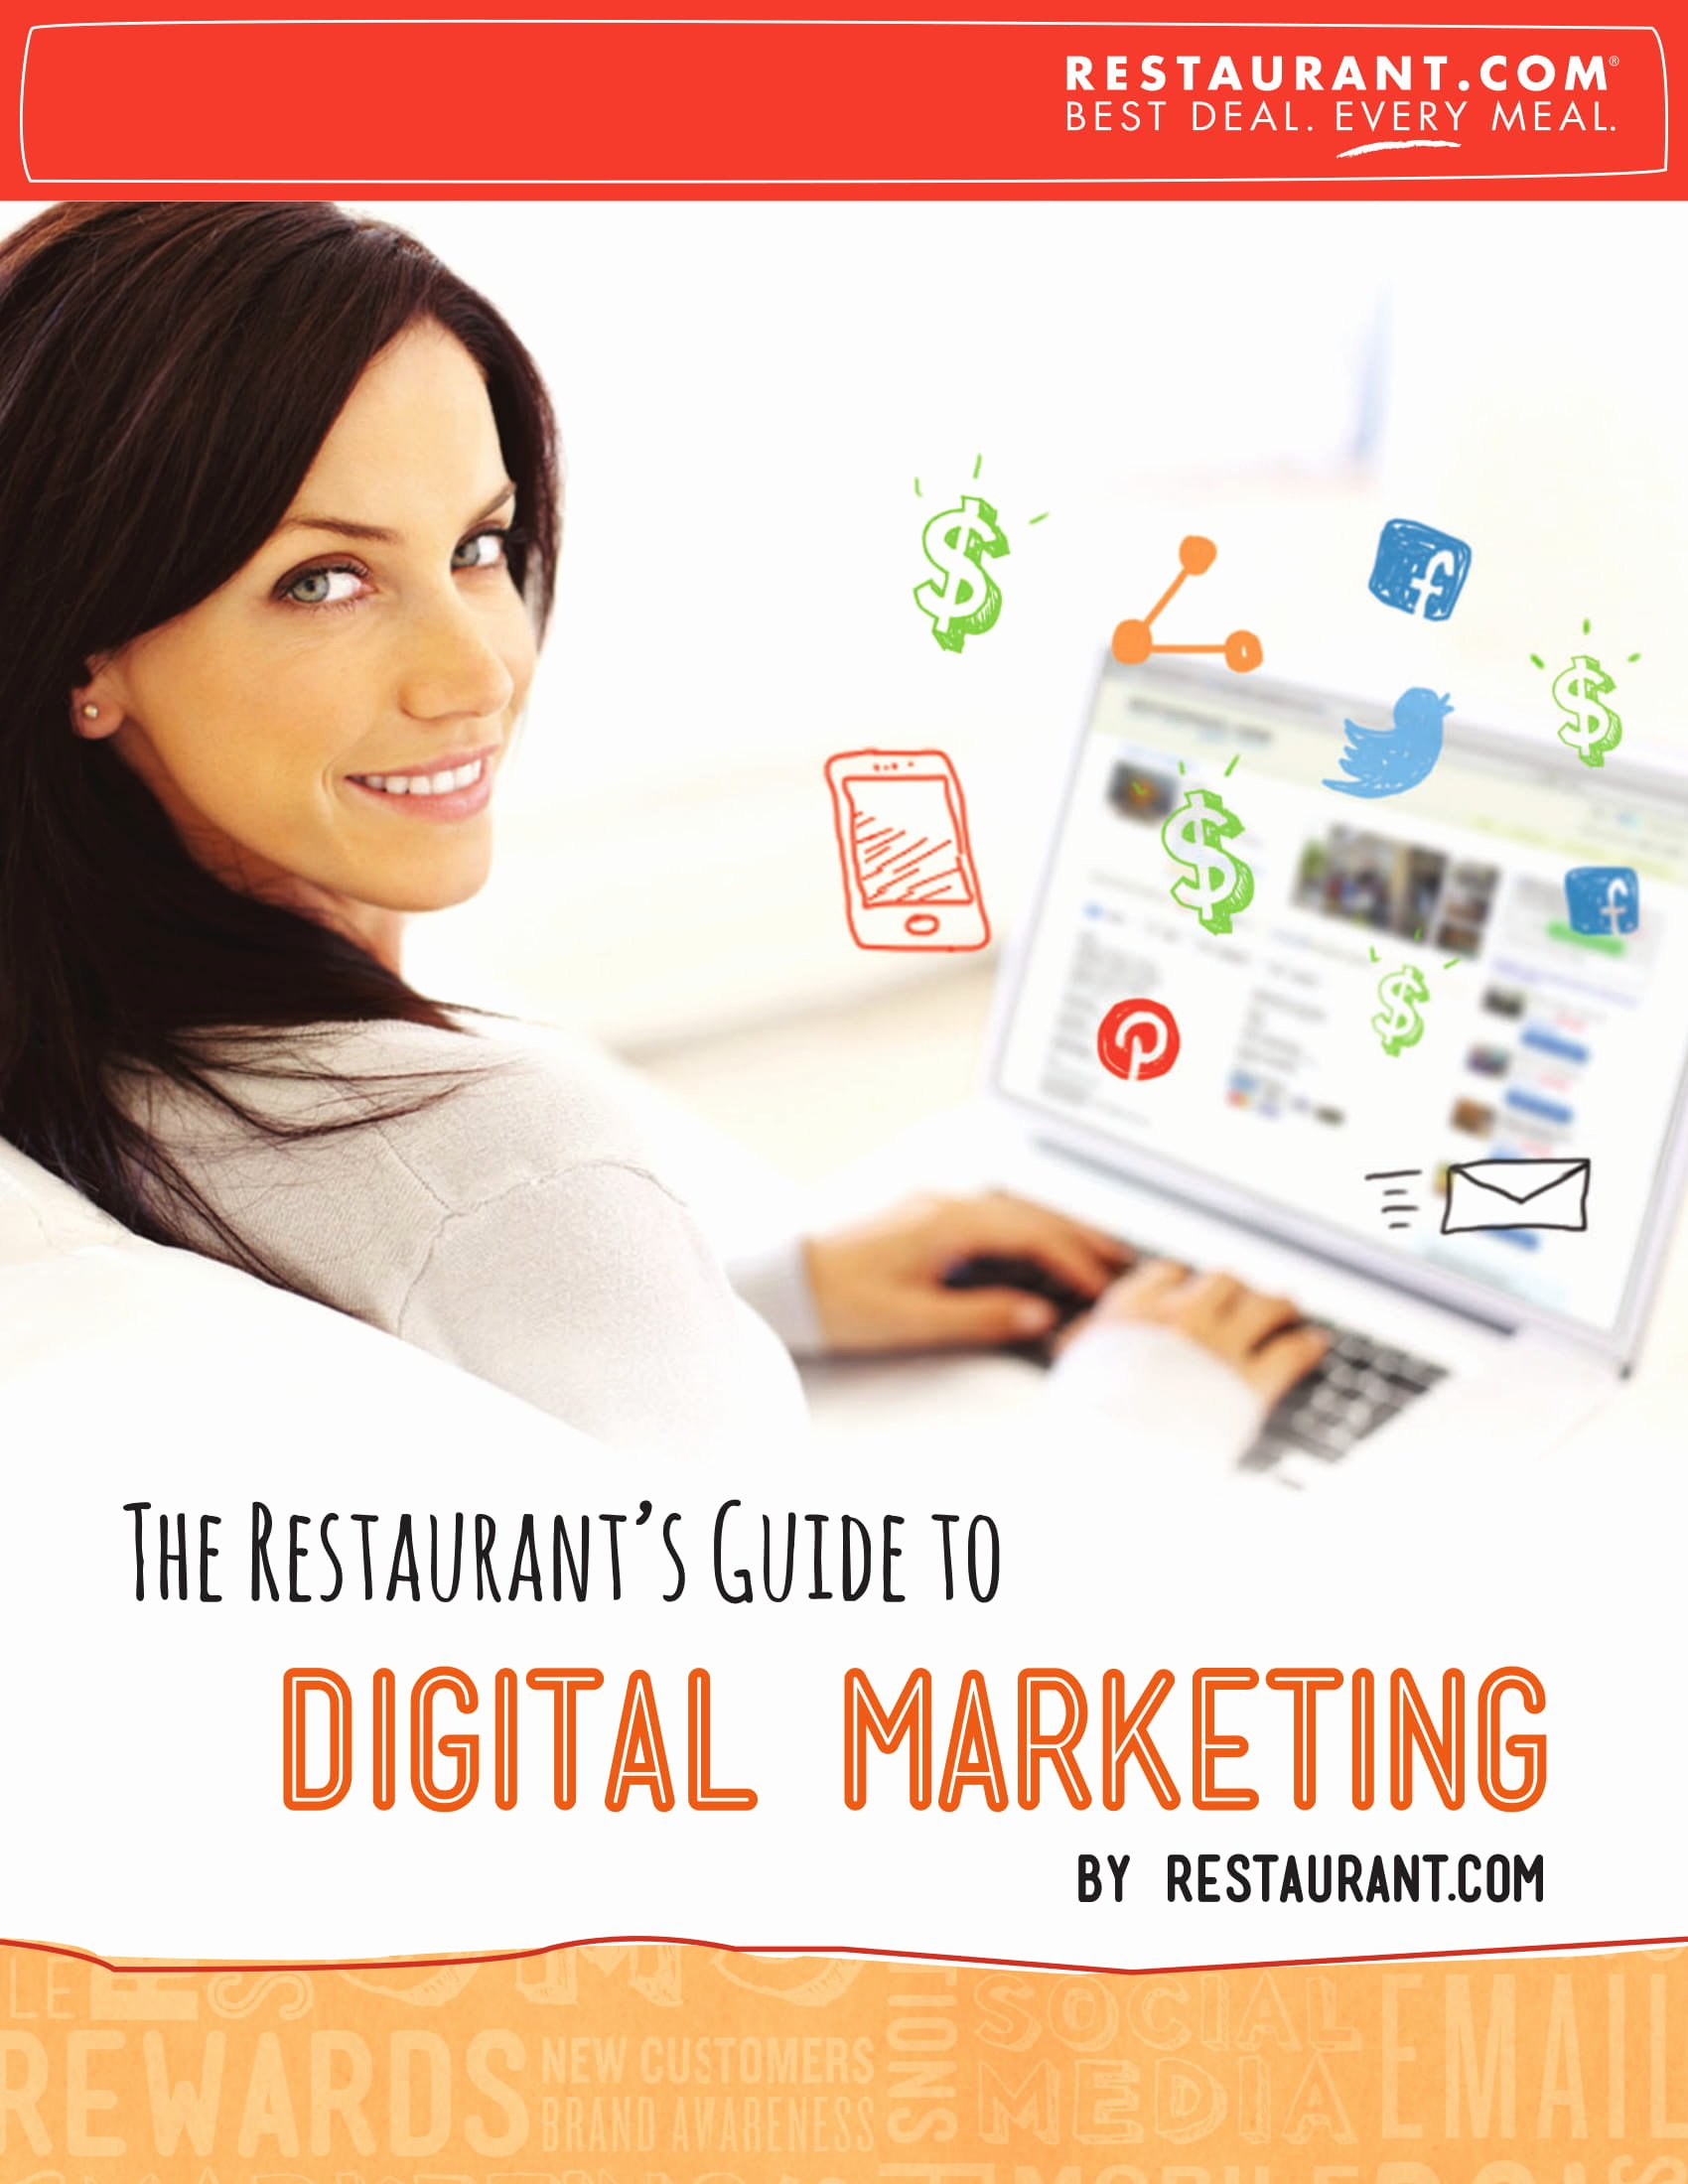 Social Media Marketing Proposal Pdf Beautiful 12 Restaurant social Media Marketing Proposal Examples